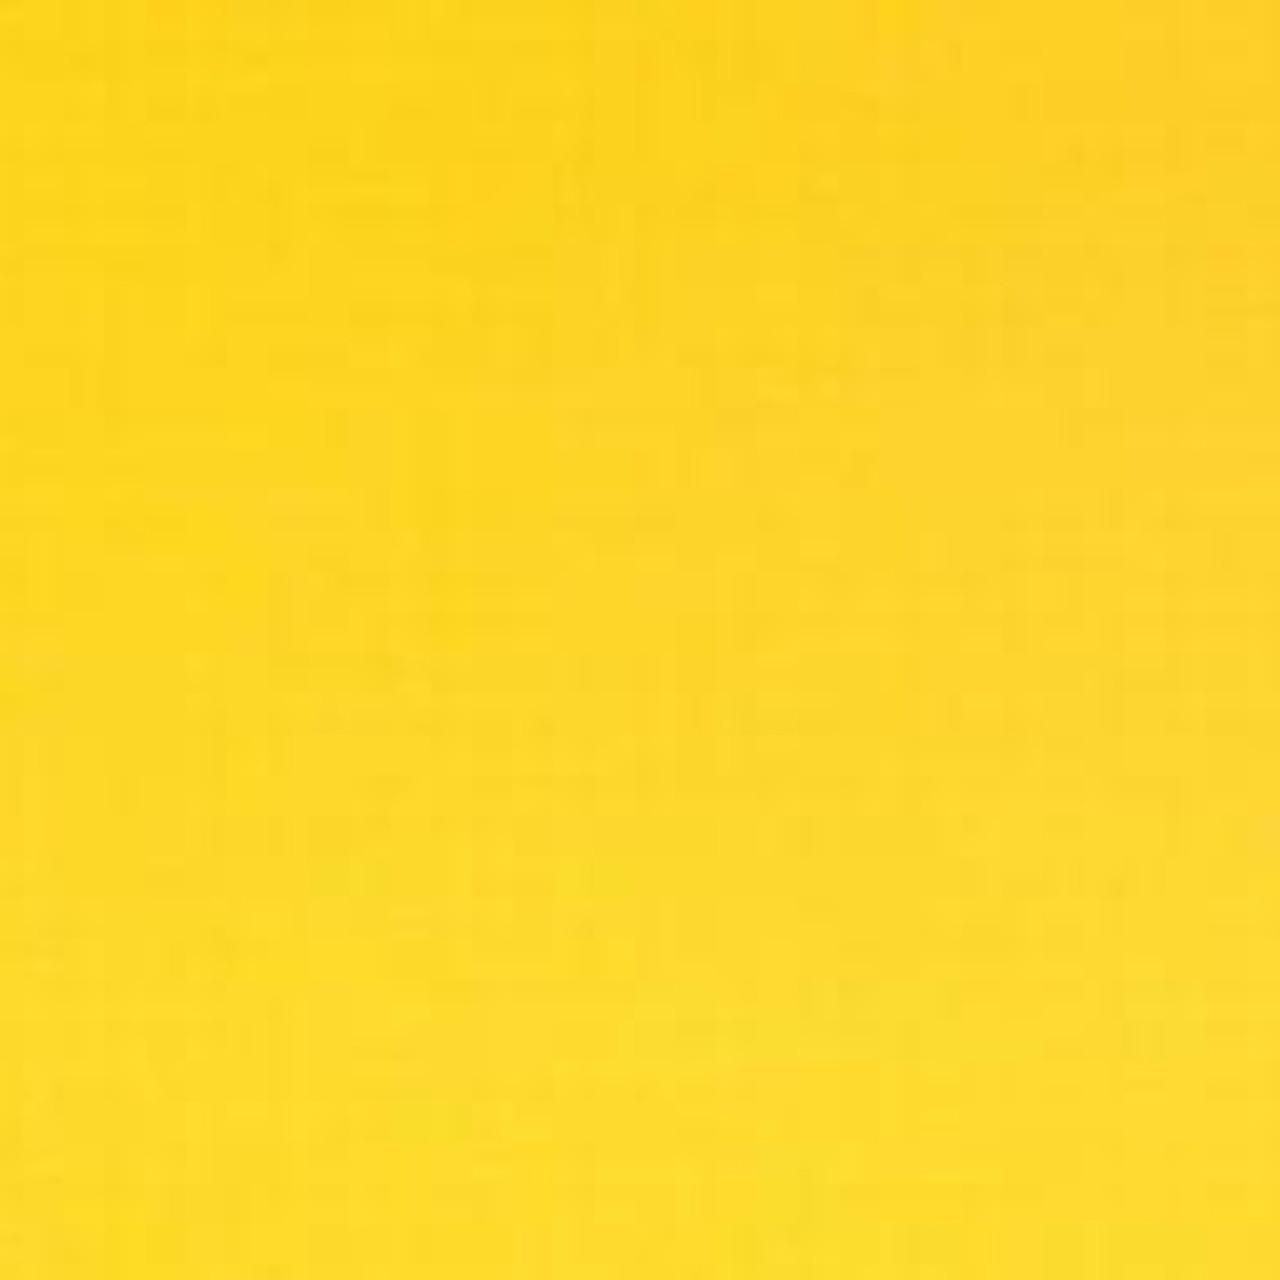 Самоклейка, PATIFIX, желтый, 45 cm